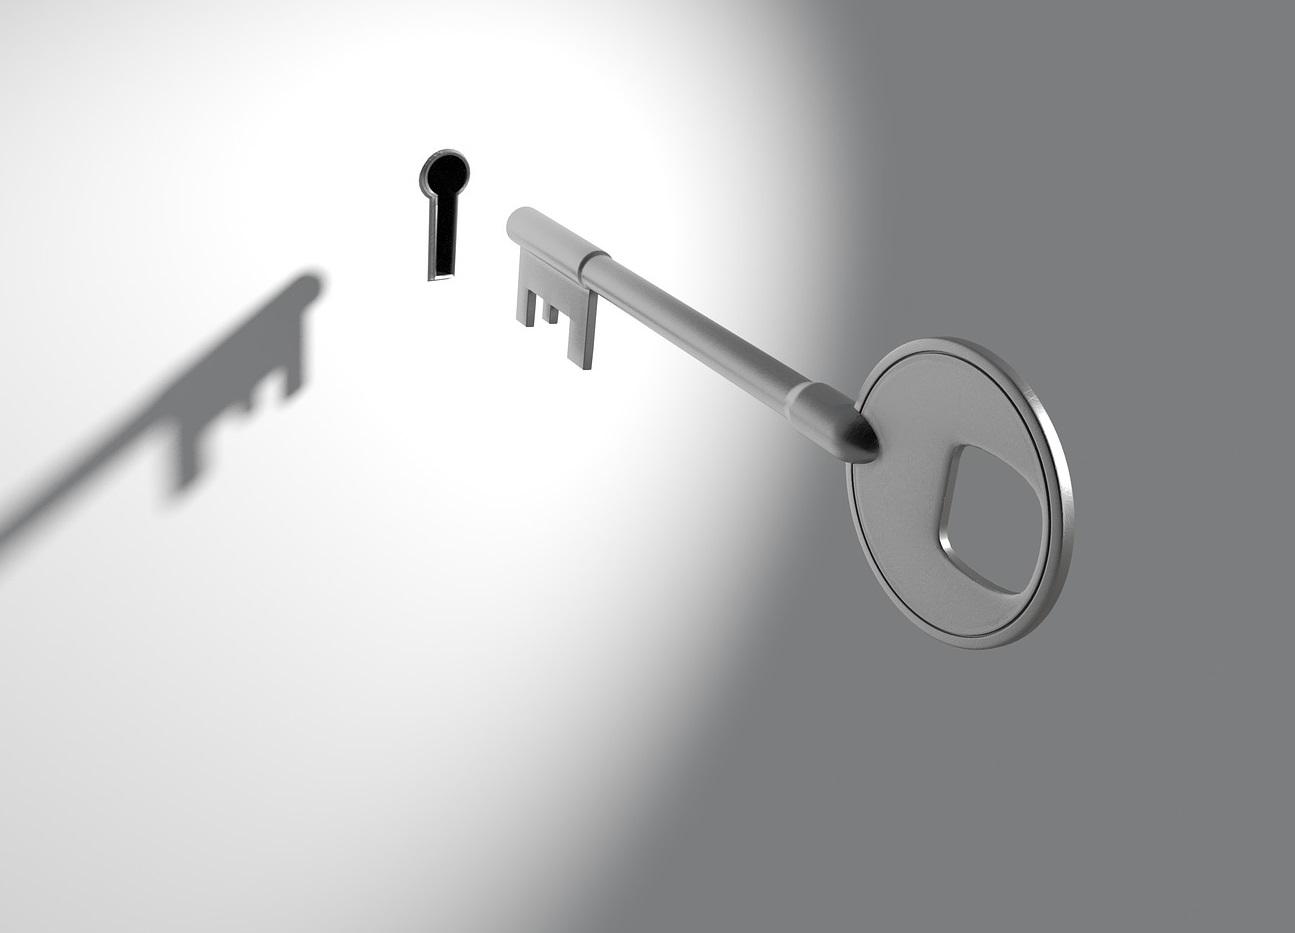 key-2114046_1920.jpg